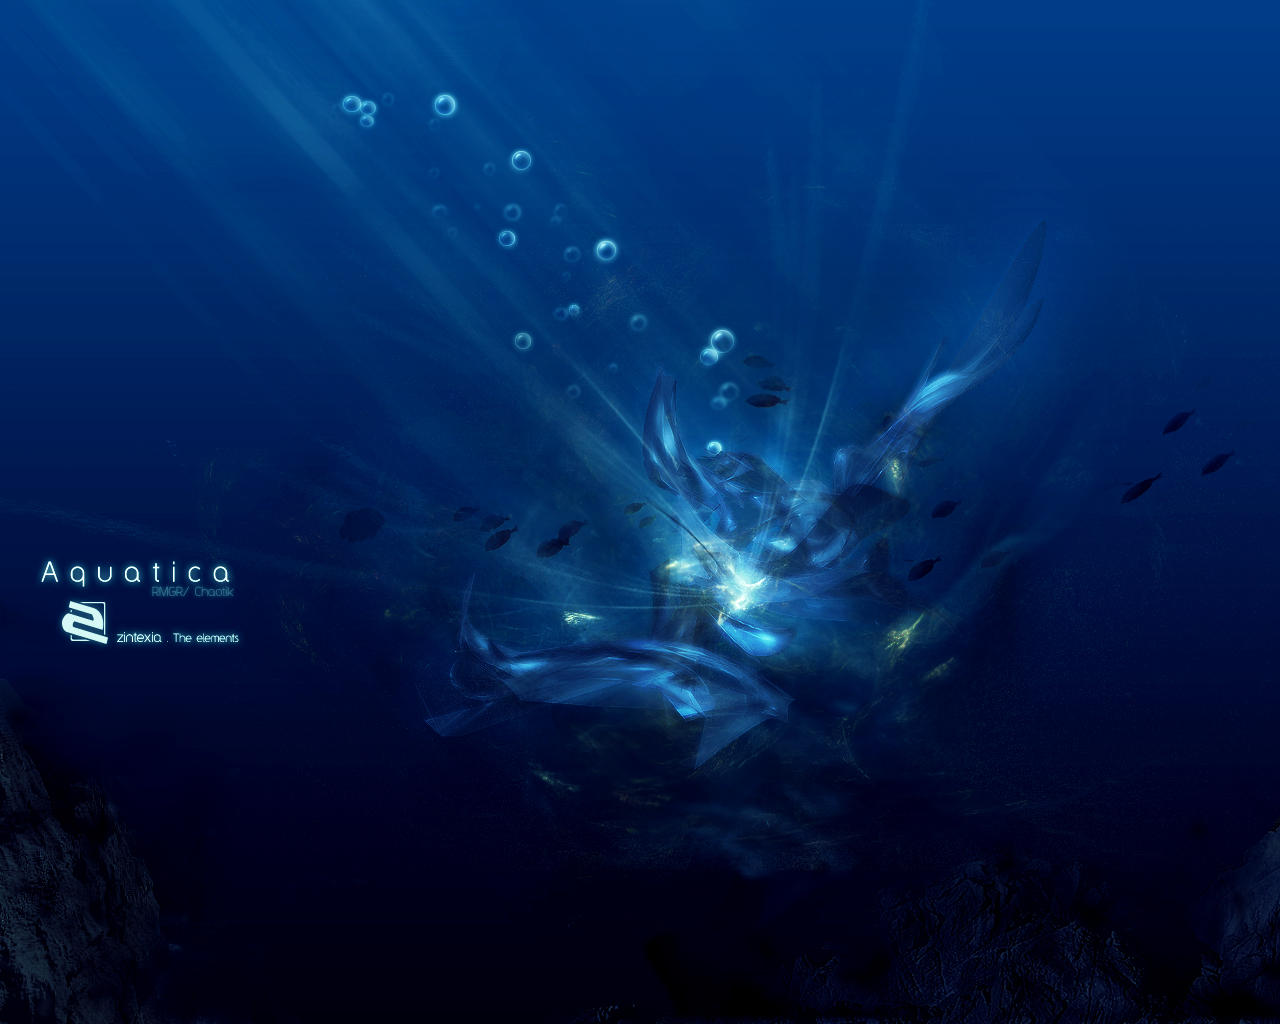 Aquatica by rmgr